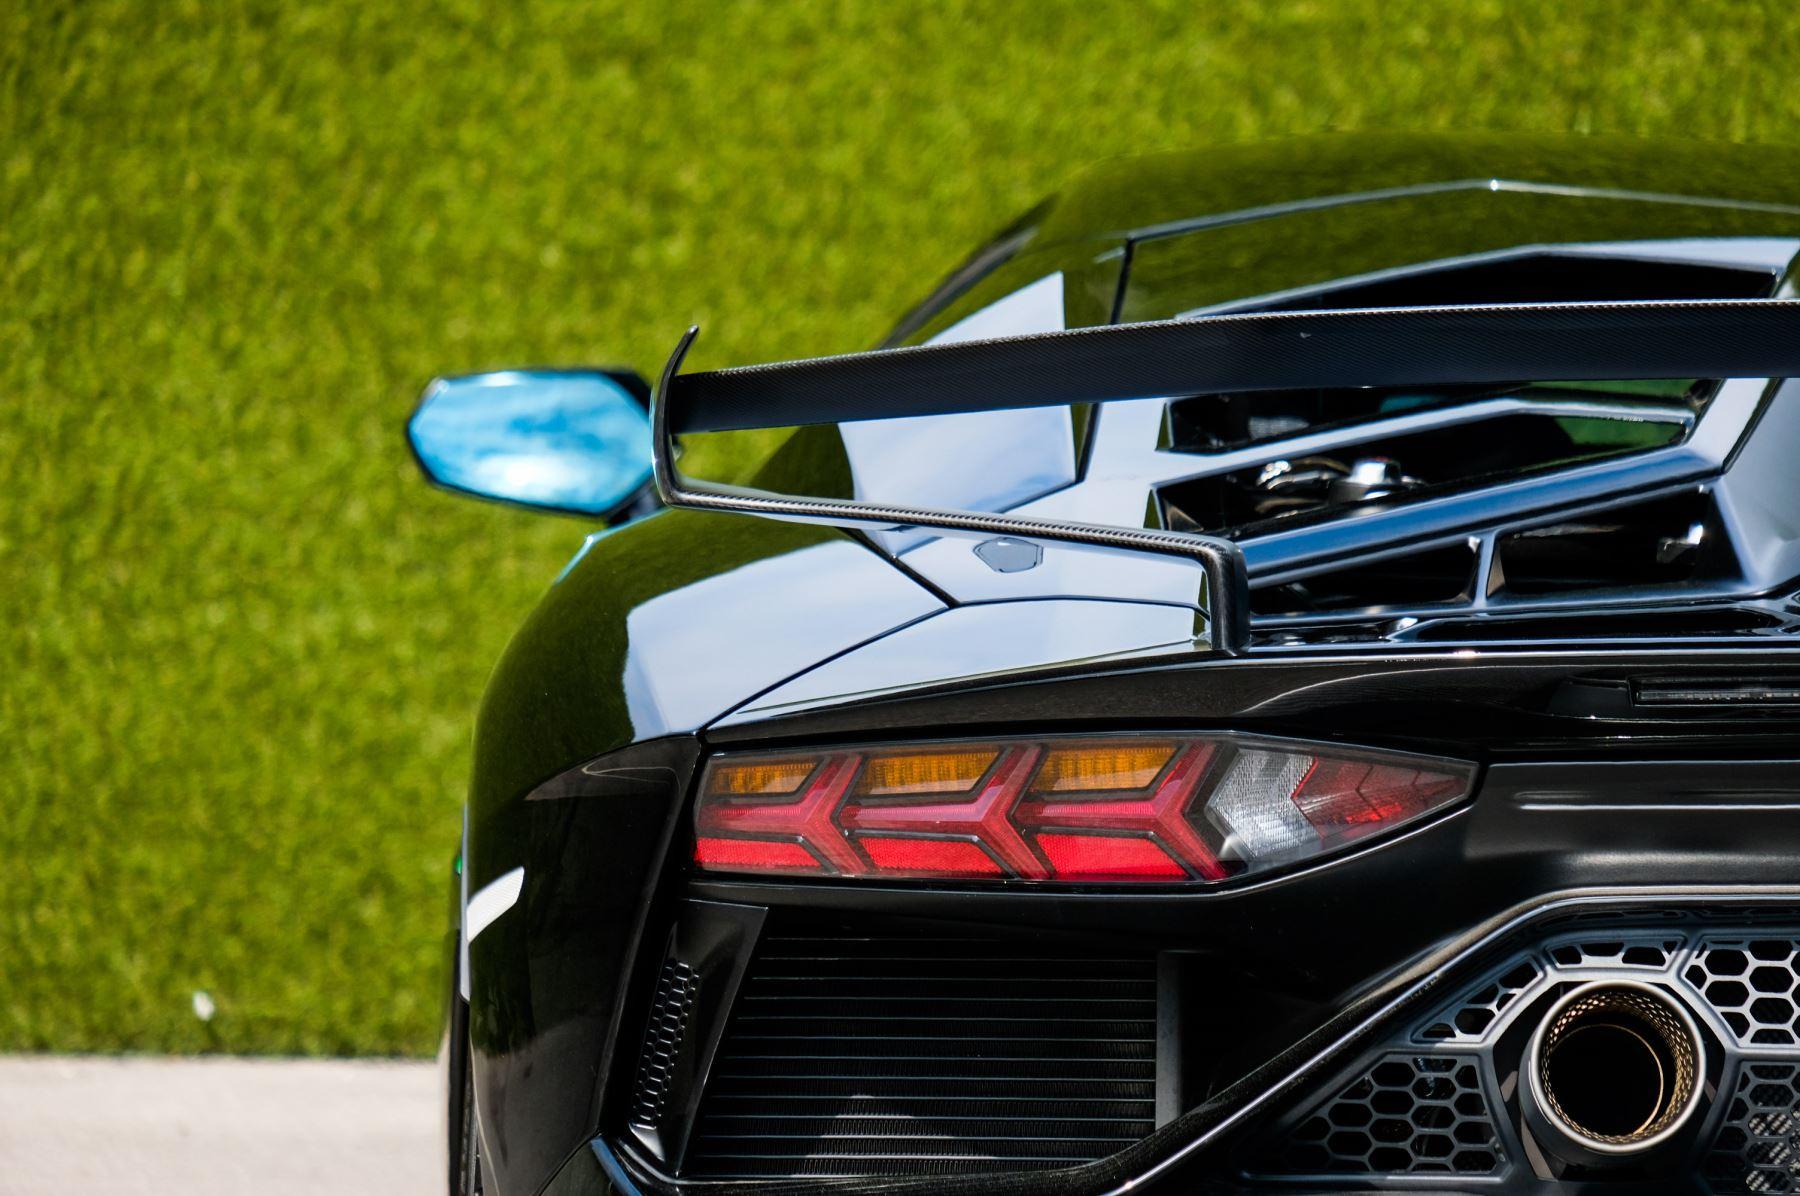 Lamborghini Aventador SVJ Coupe LP 770-4 SVJ image 11